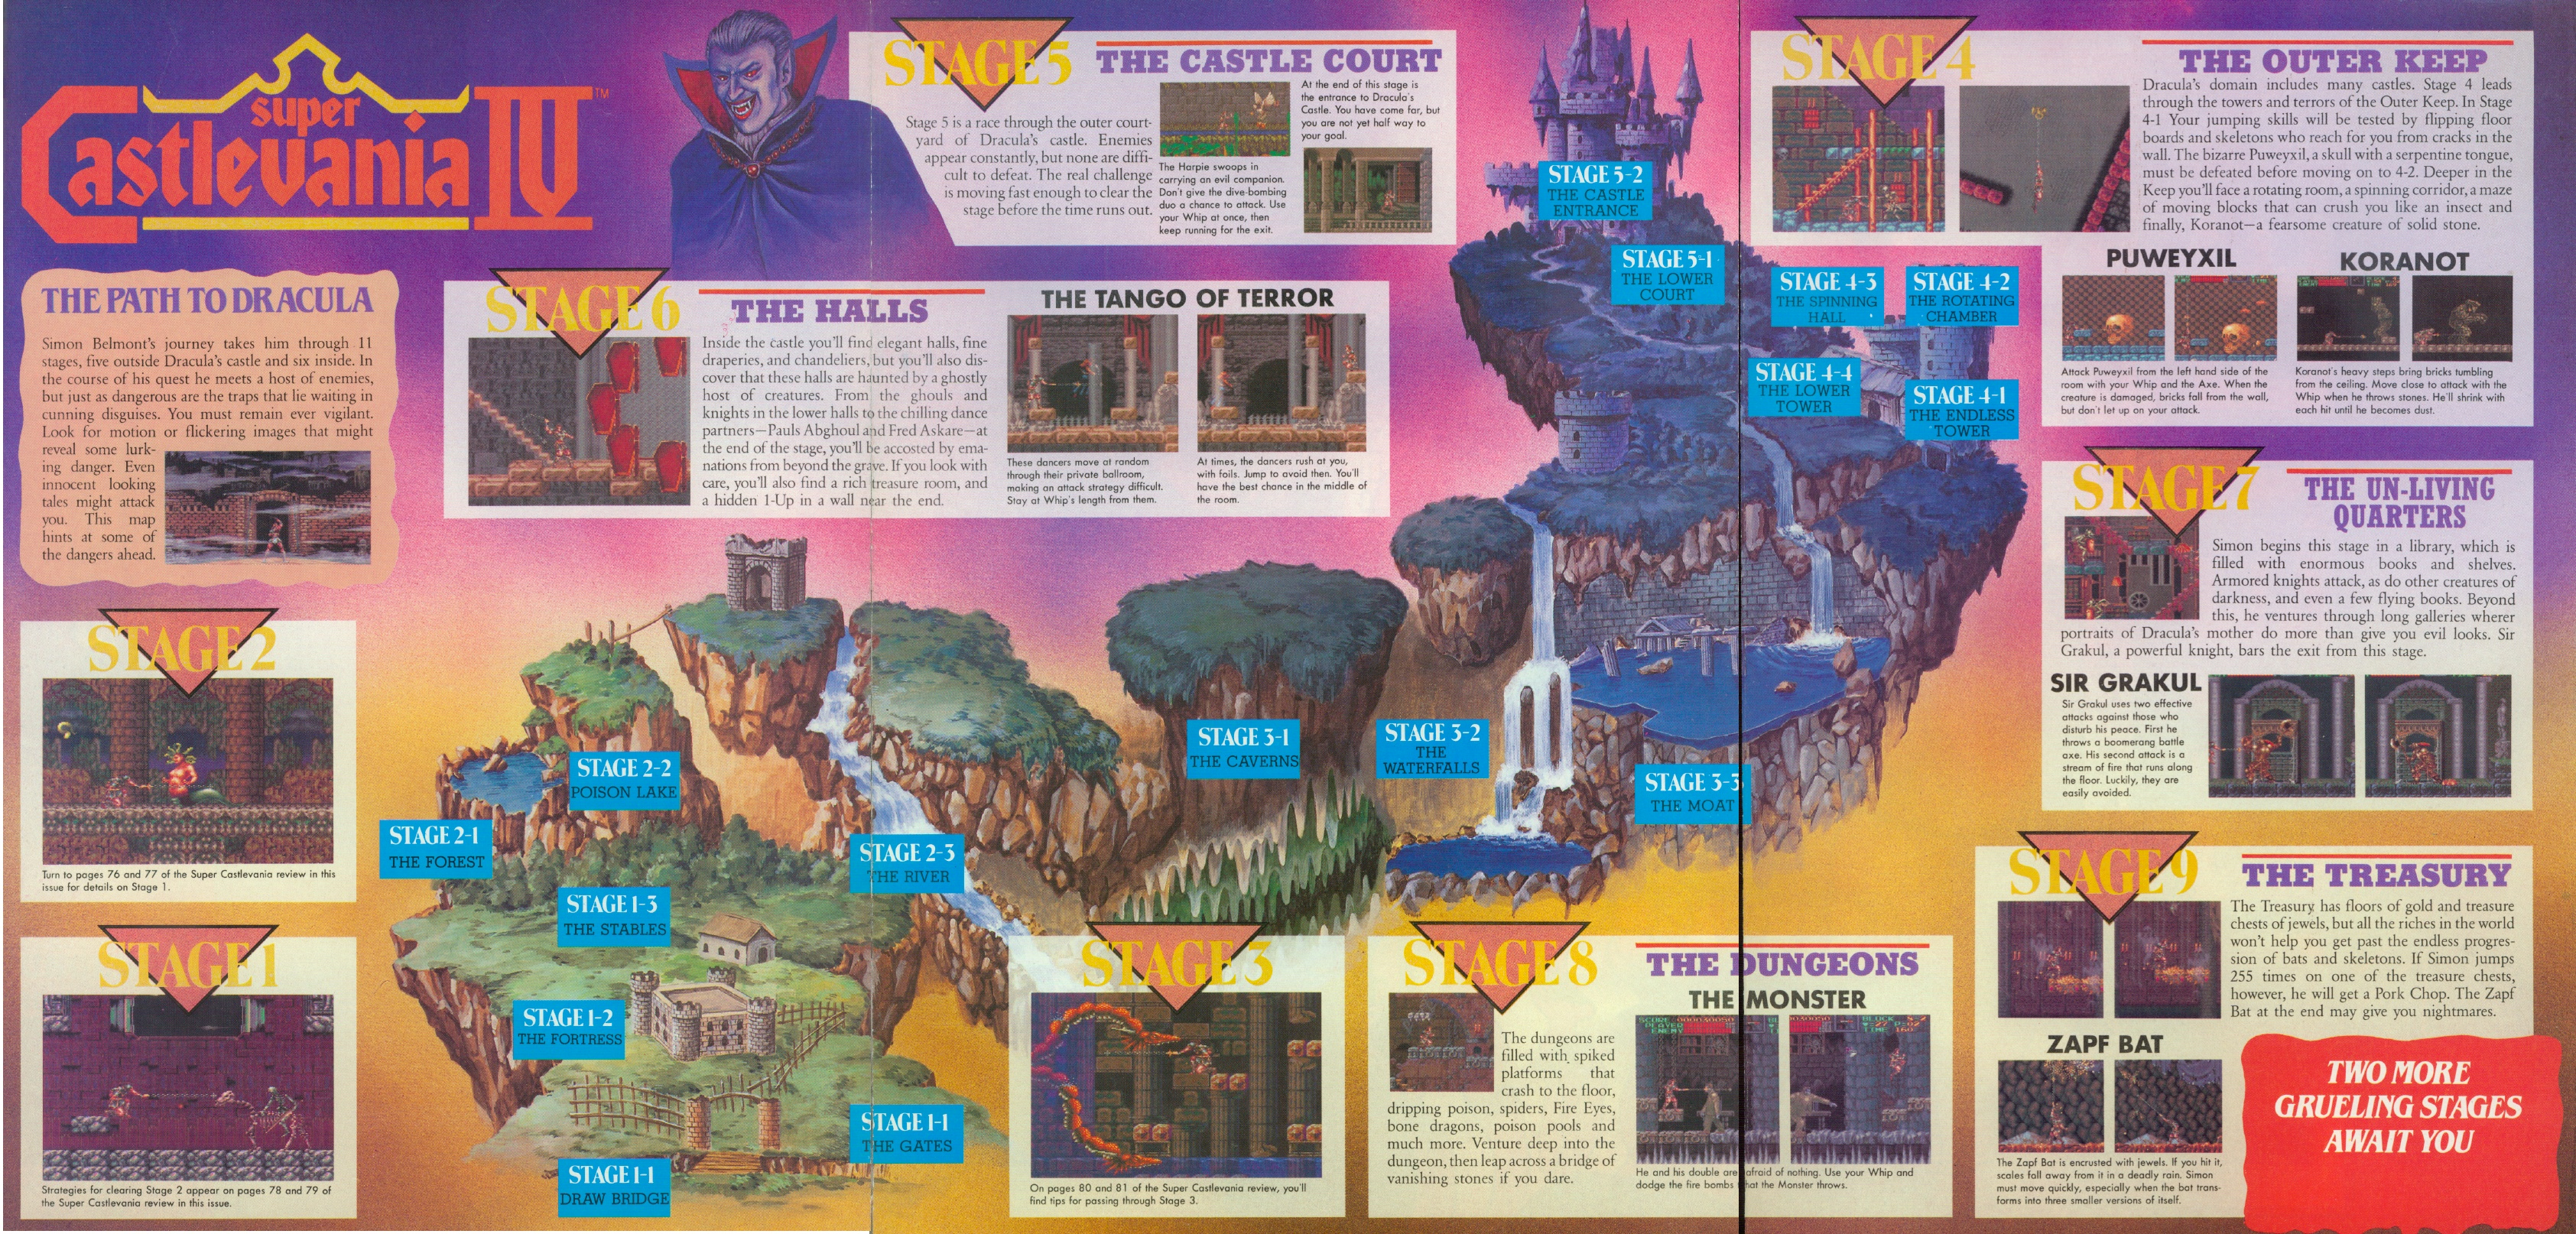 Castlevania World Map.Vampire Killer A Castlevania Gallery Translation Resource